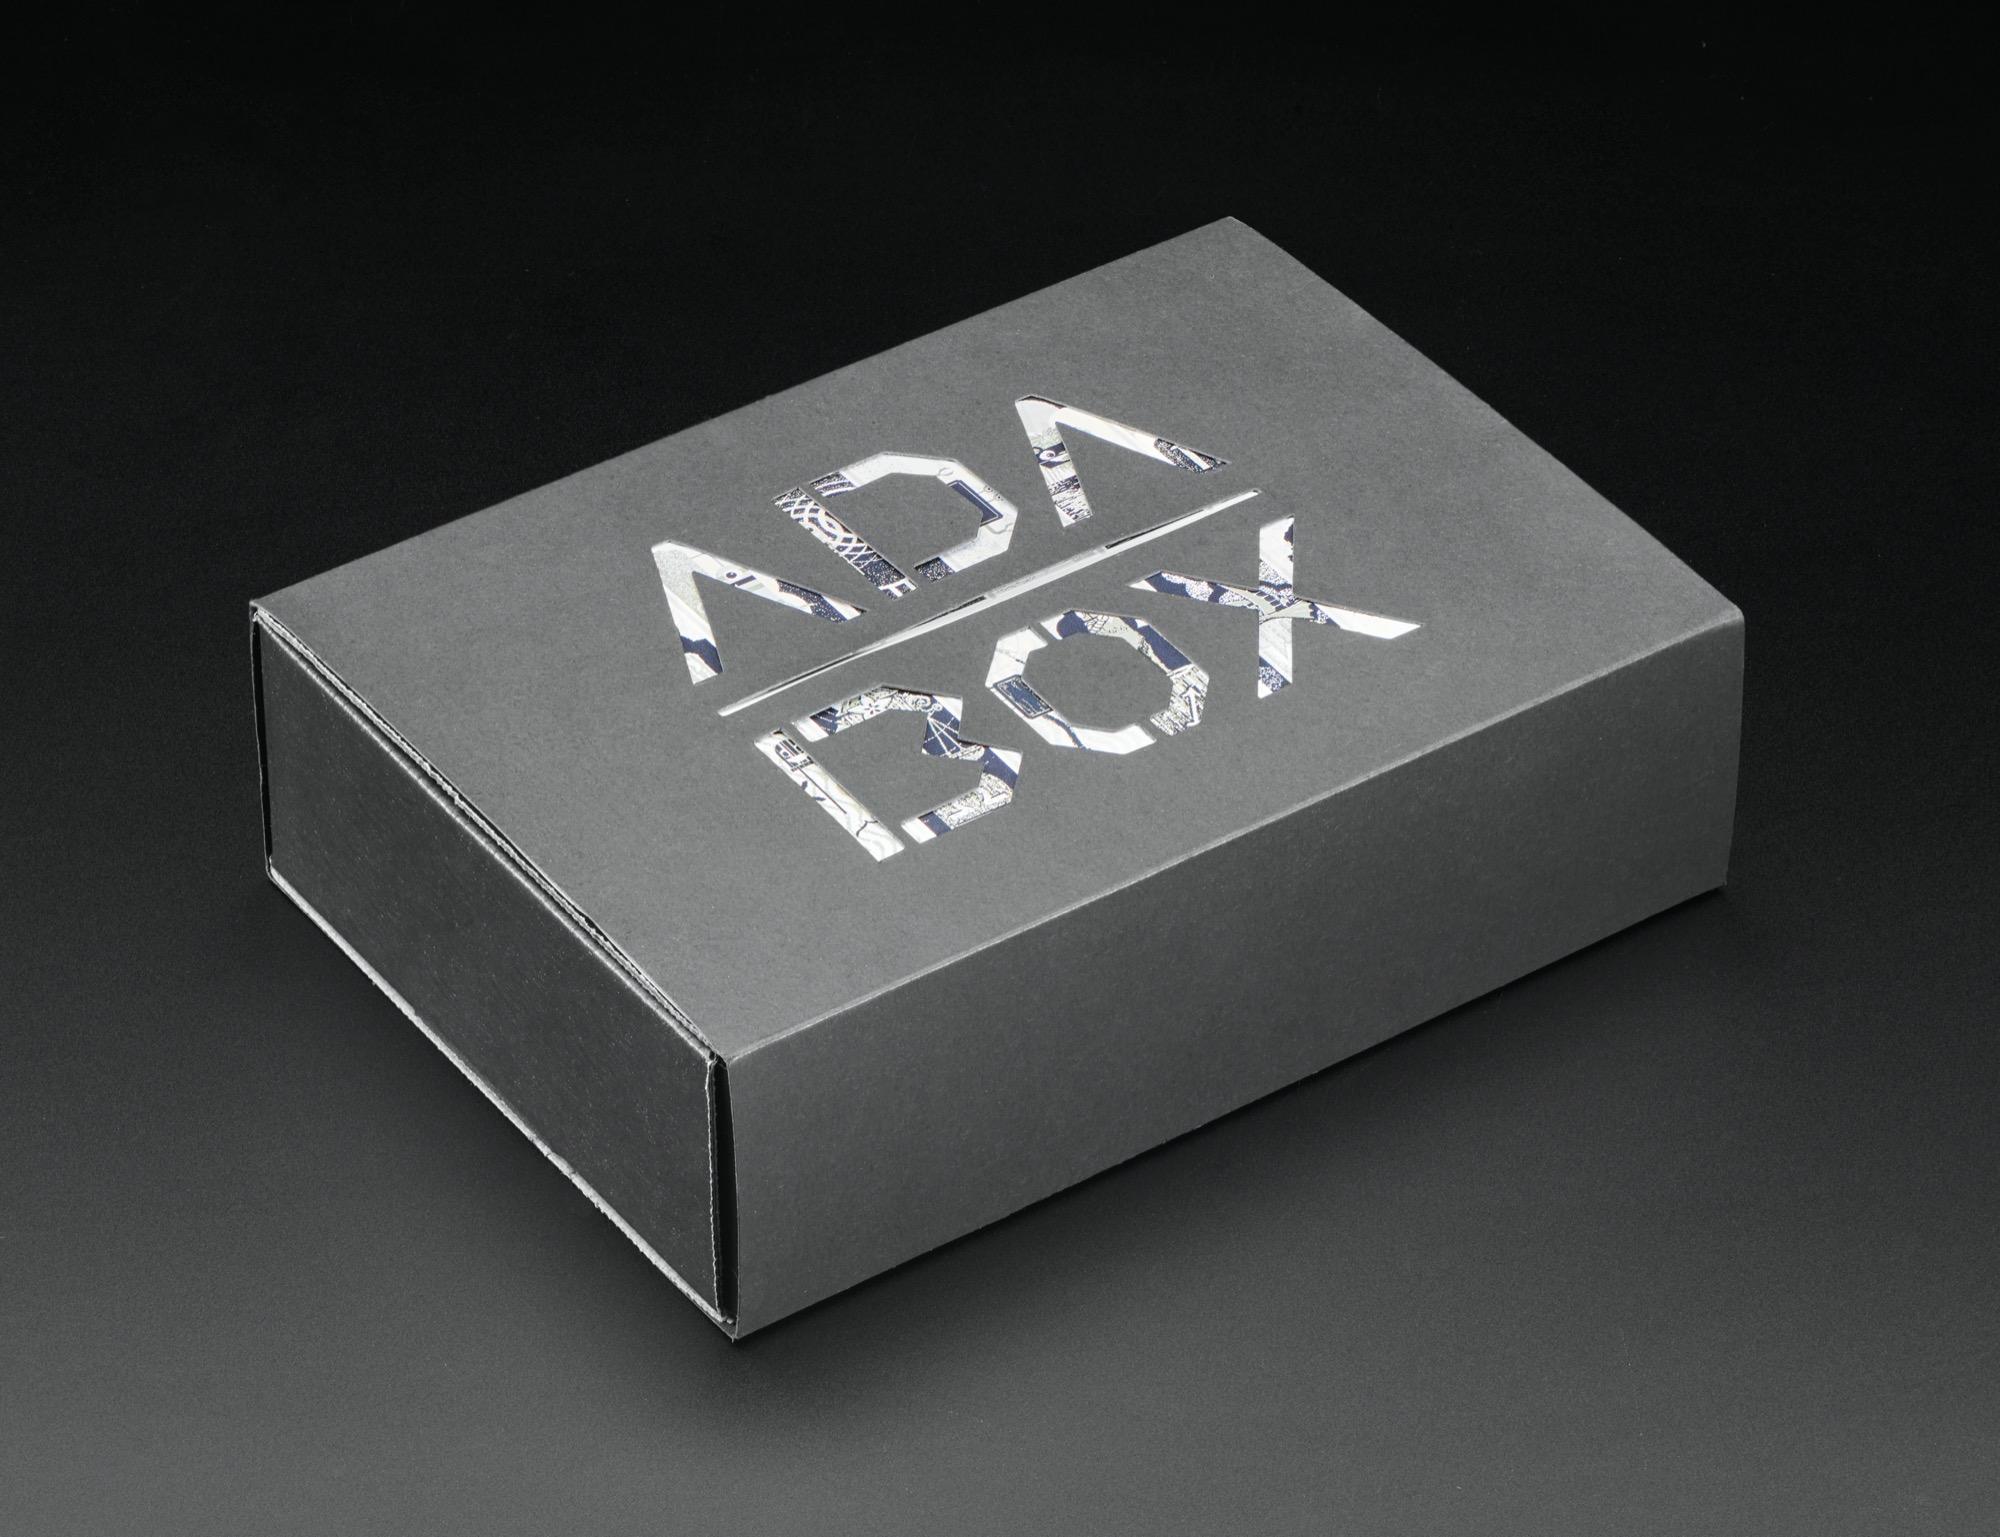 adabox_4751_Adabox_17_iso_packaging__2k__2020_11.jpg